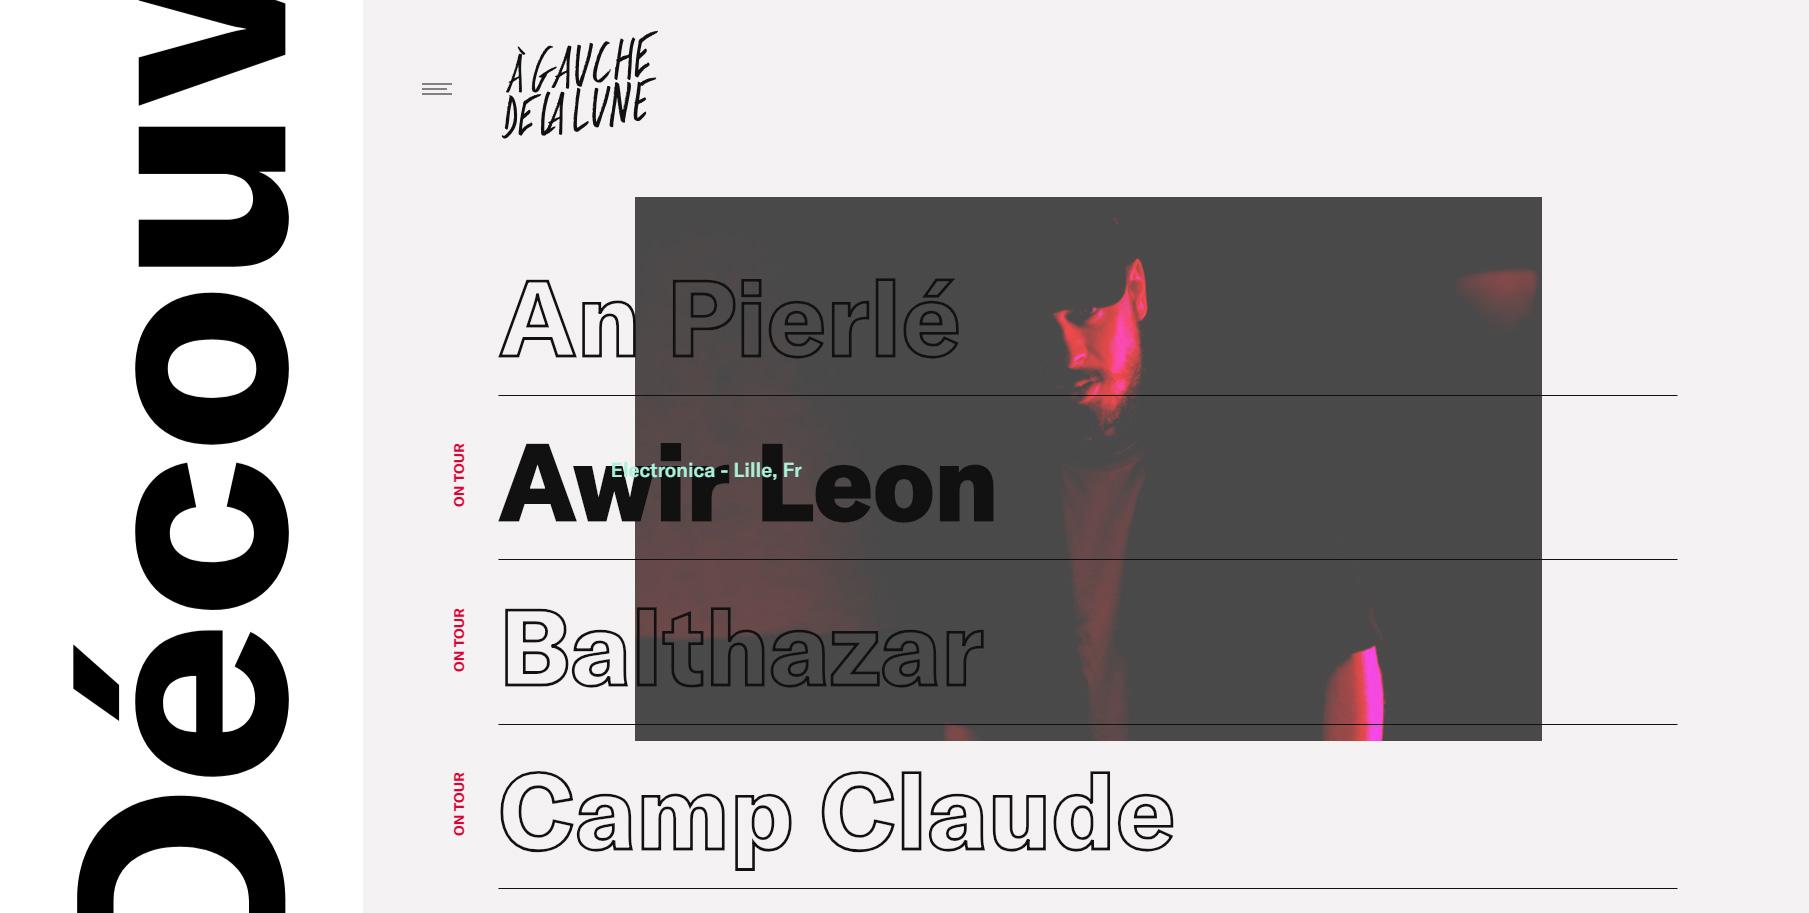 A Gauche de la Lune - Website of the Day